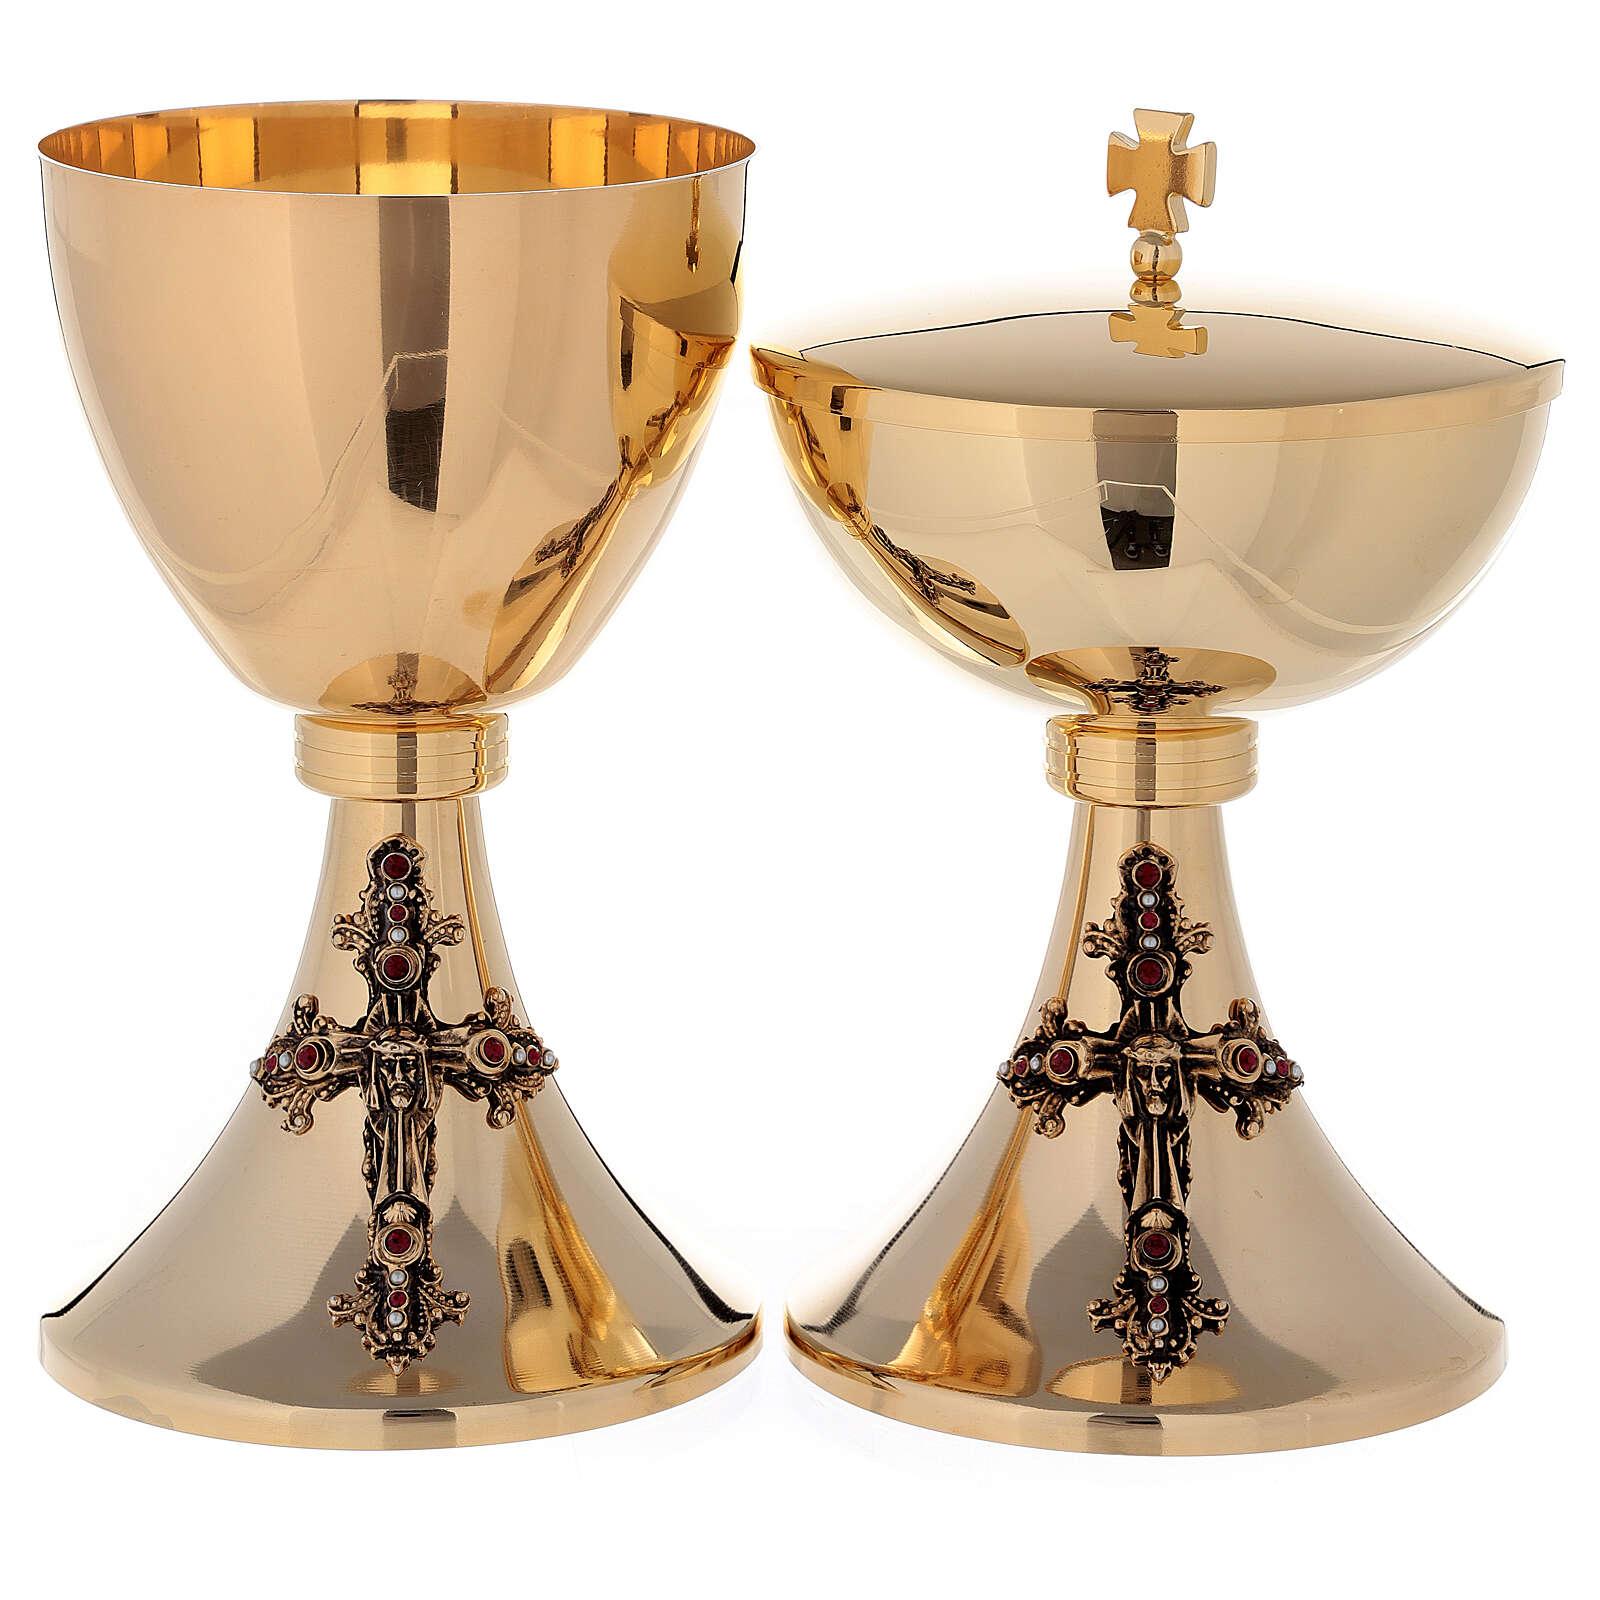 Cáliz y Copón Jesús de latón dorado 24k 4